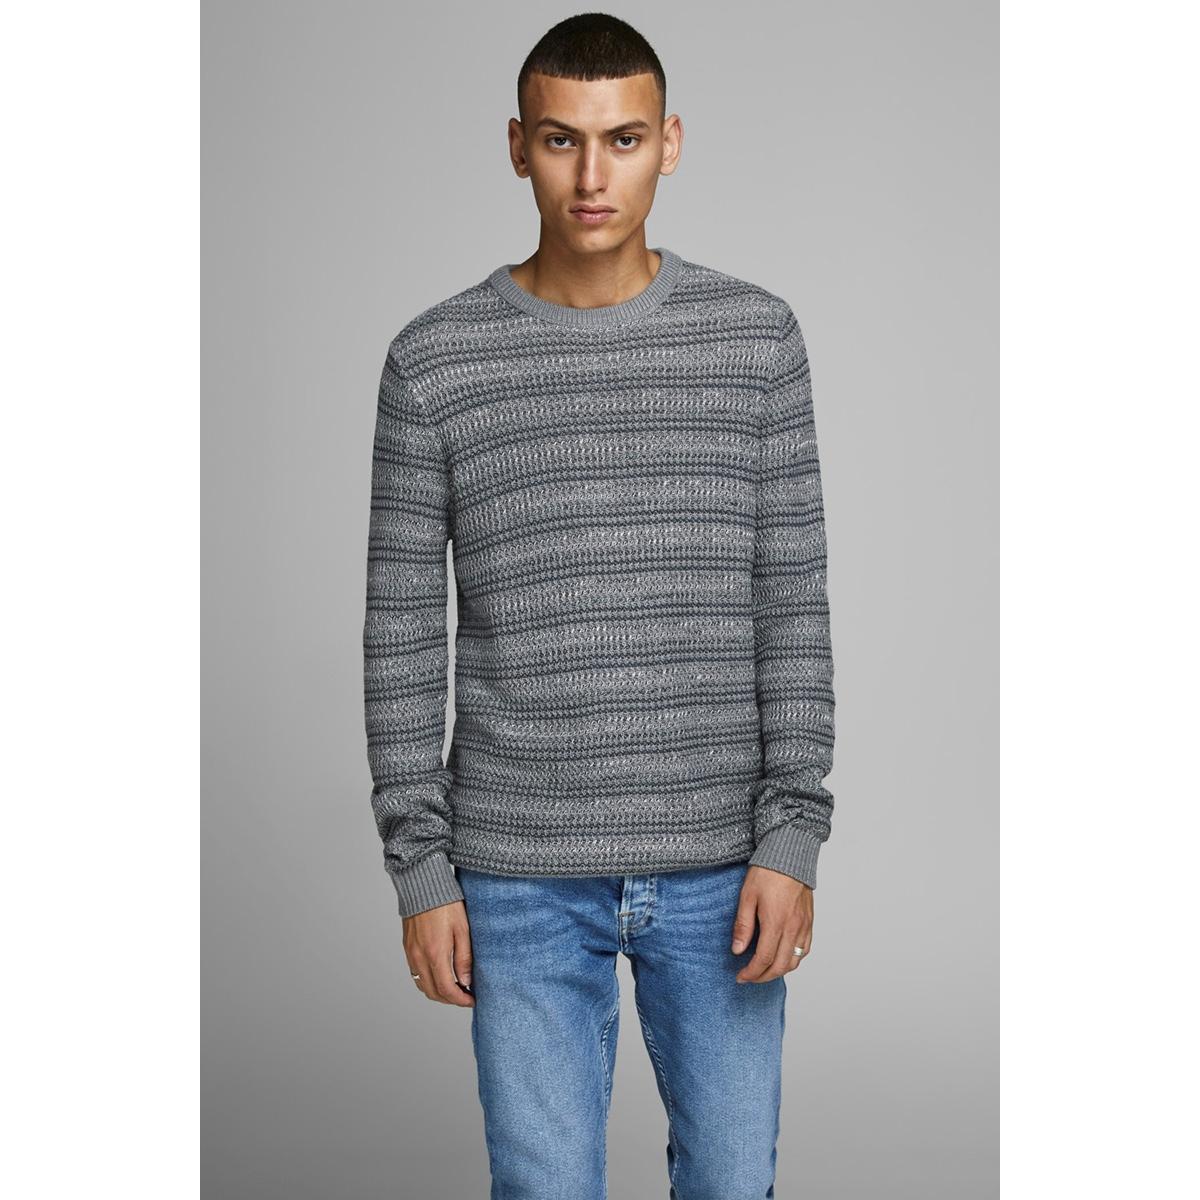 jorflow knit crew neck. 12162644 jack & jones trui grey melange/stripe kni